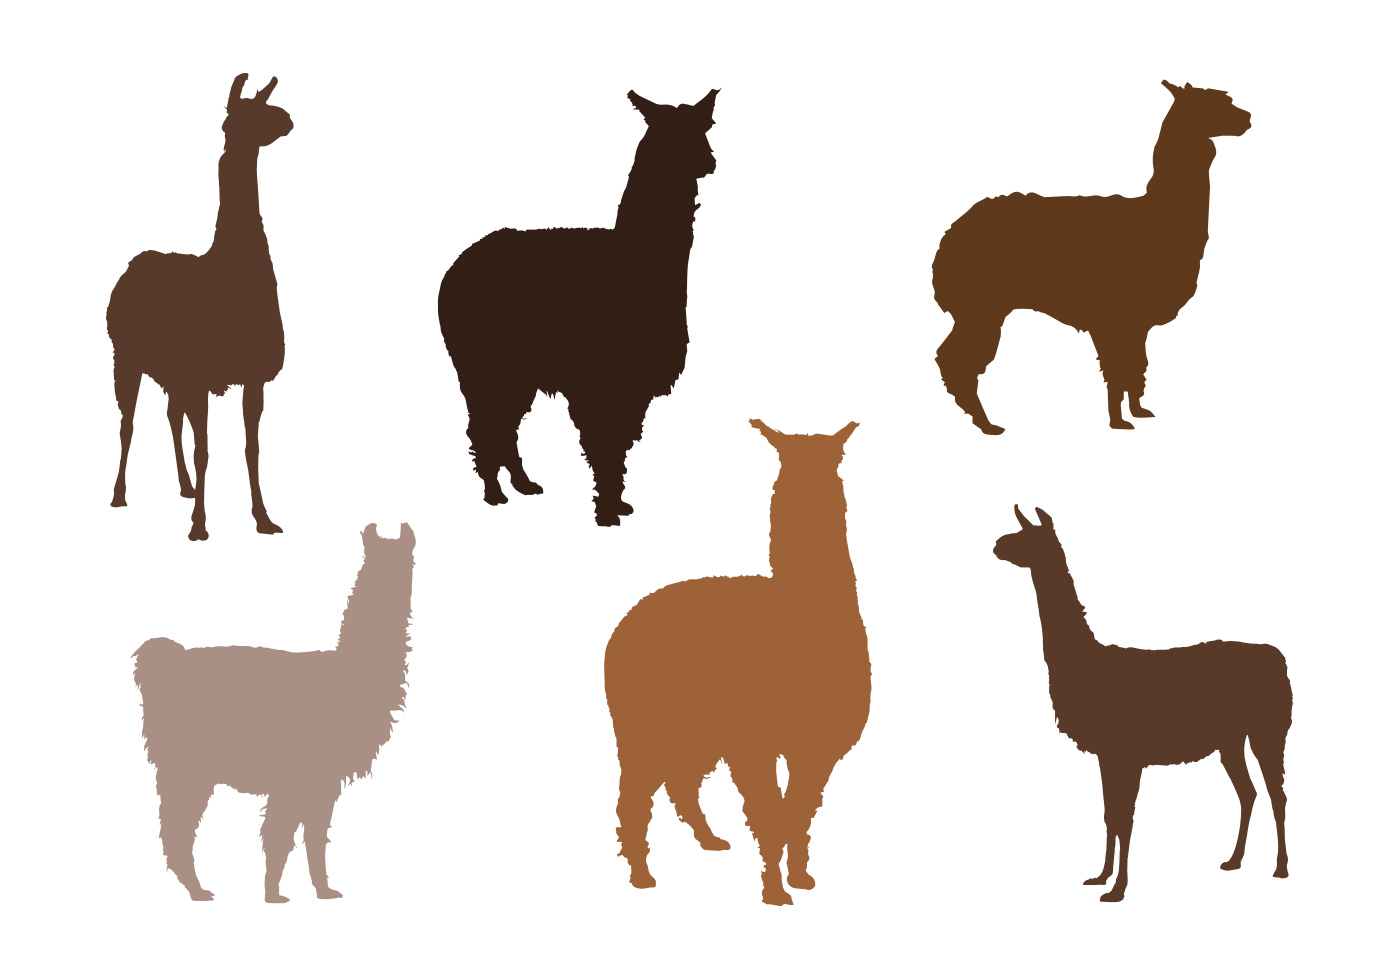 alpaca vector silhouettes download free vector art